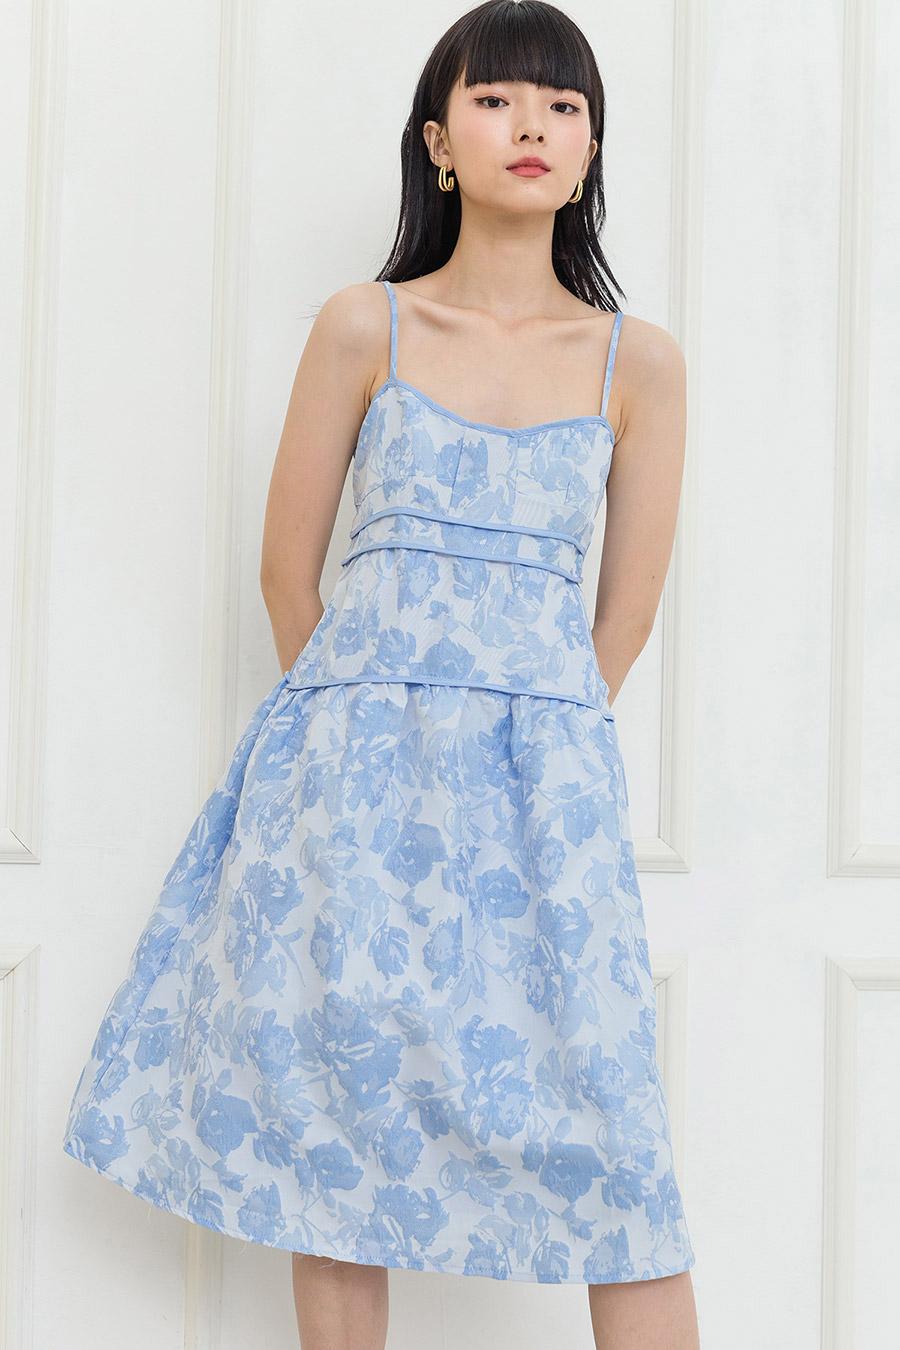 BETH DRESS - LAGOON FLEUR